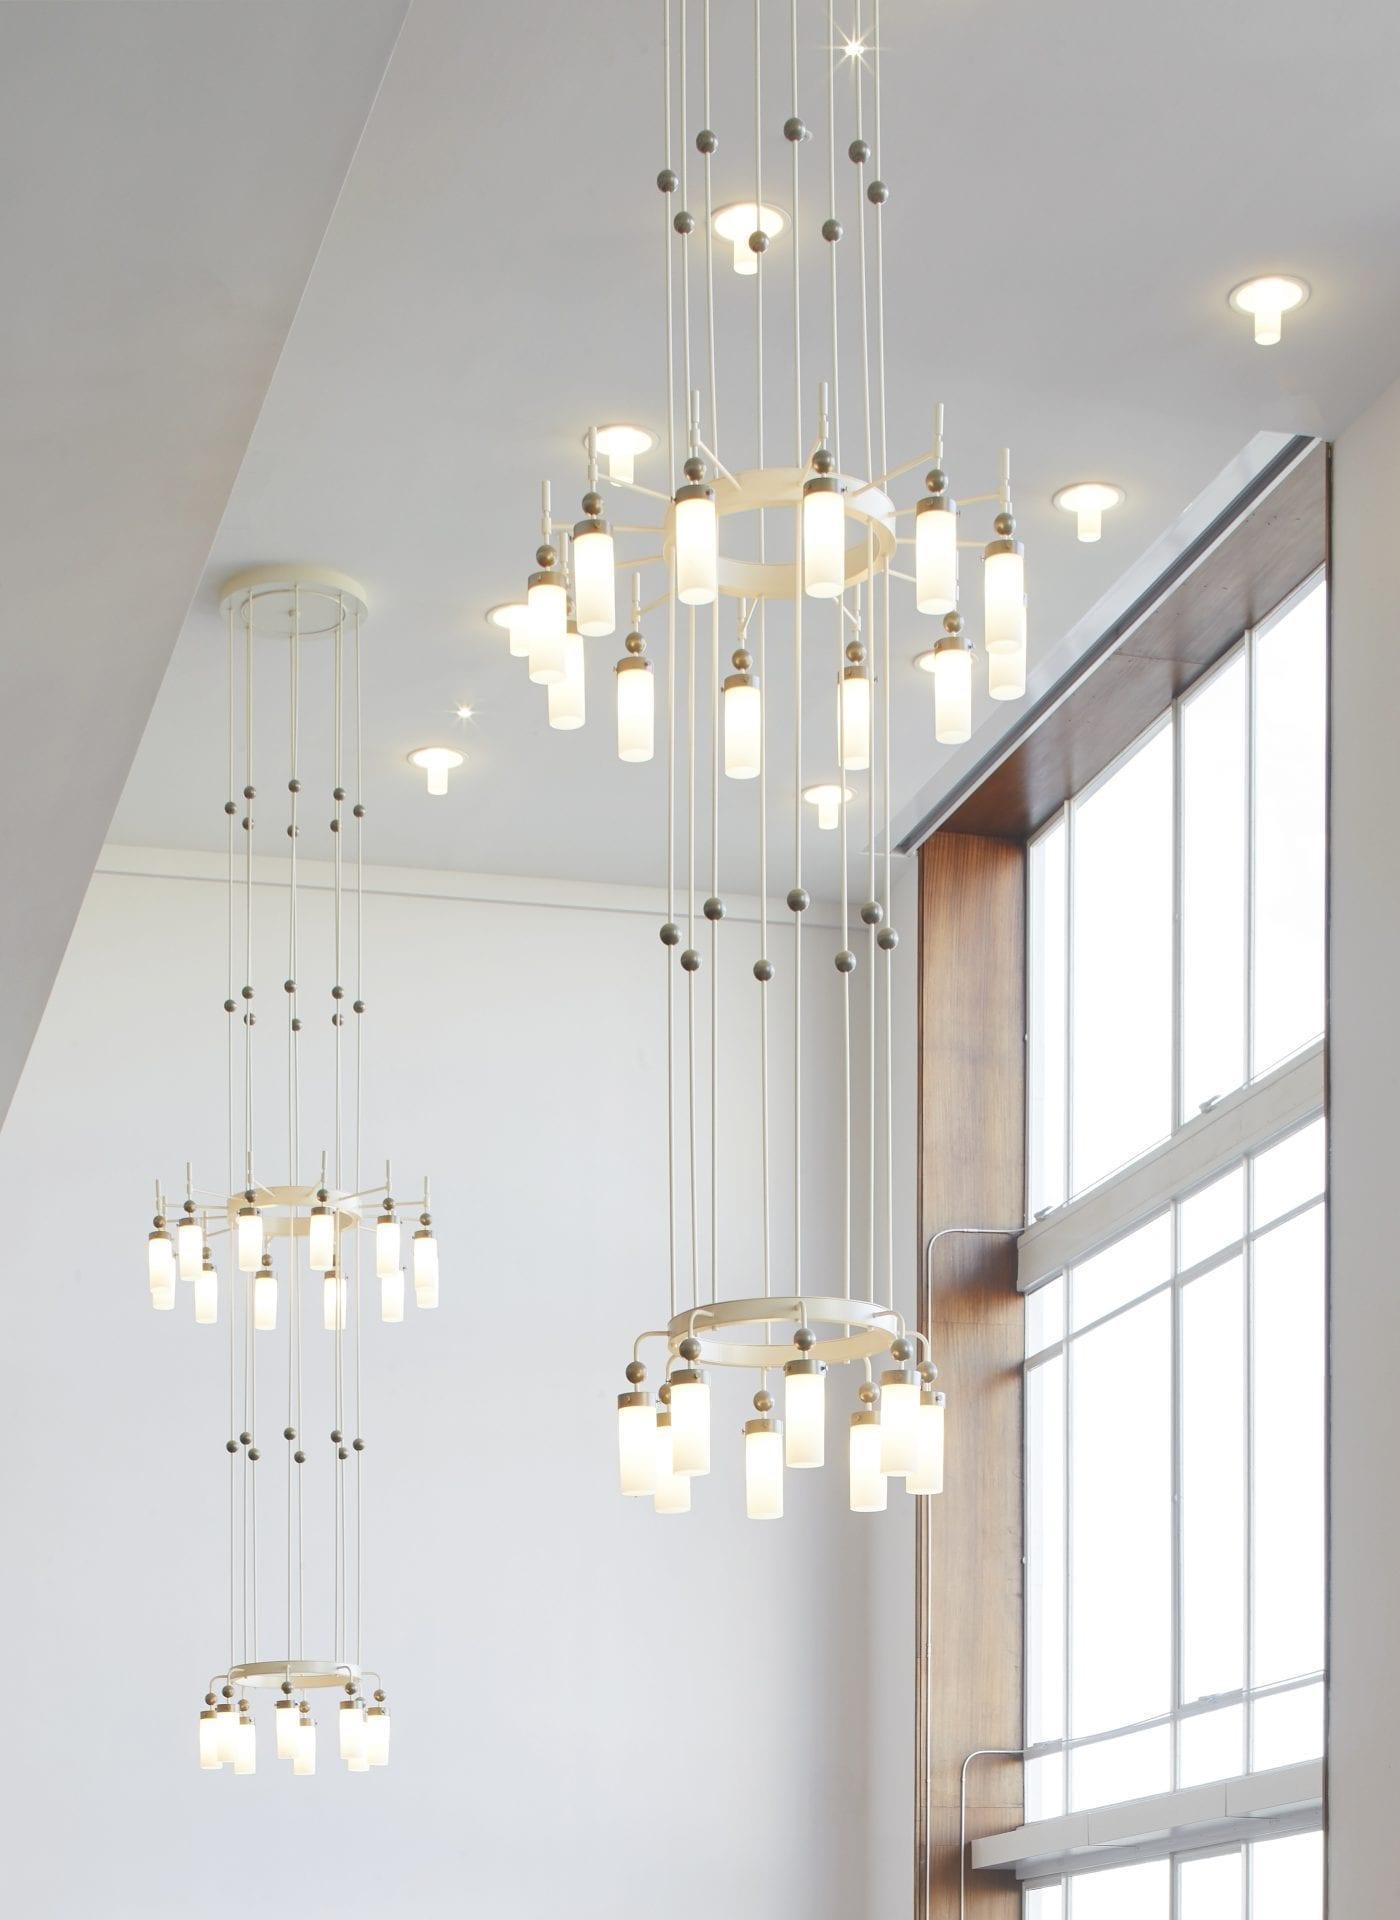 Fairfield Halls Lights Image